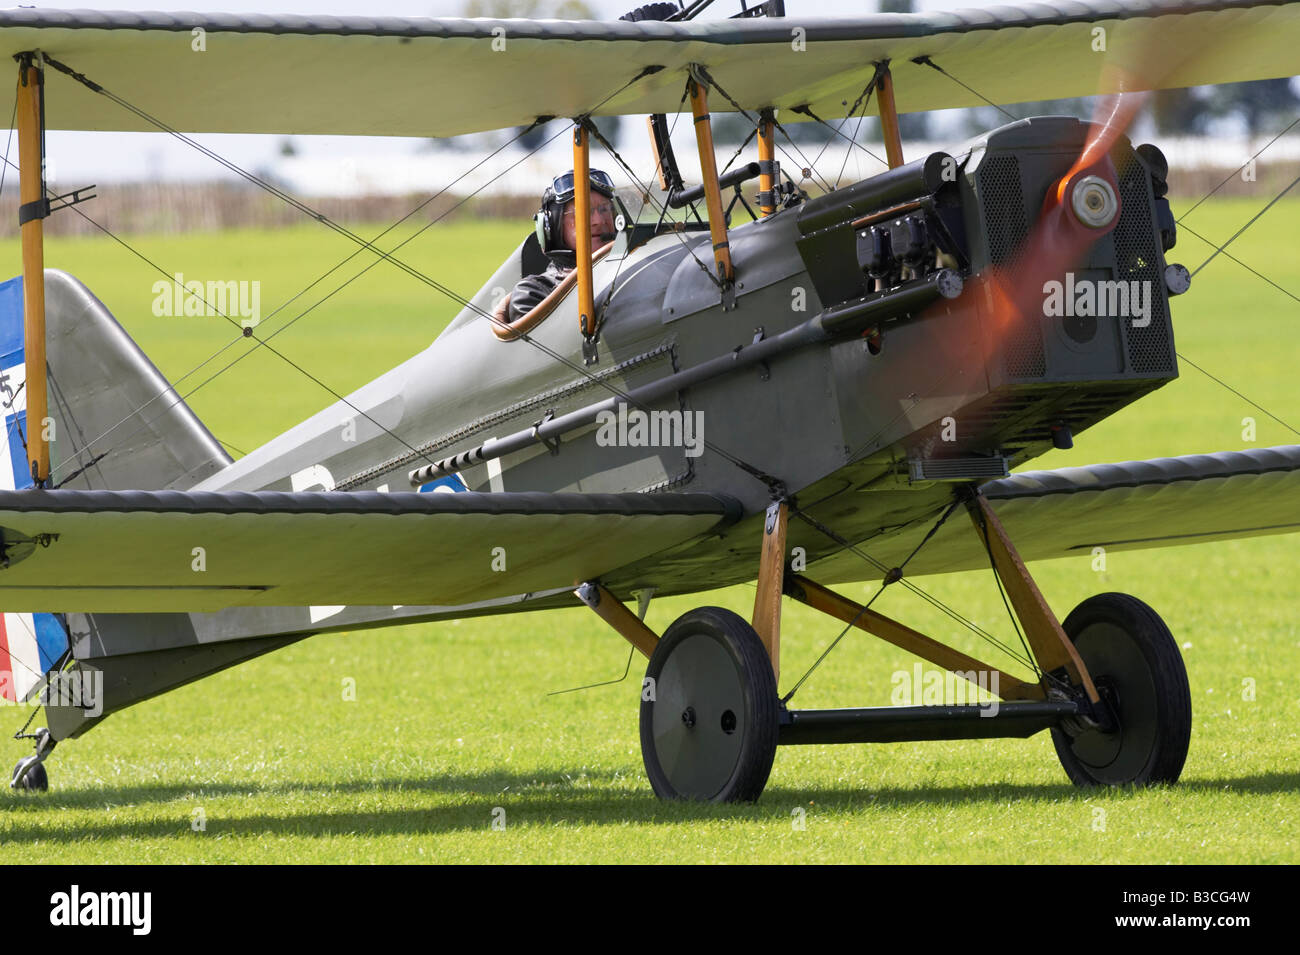 Vintage WW I World War One aircraft - Stock Image